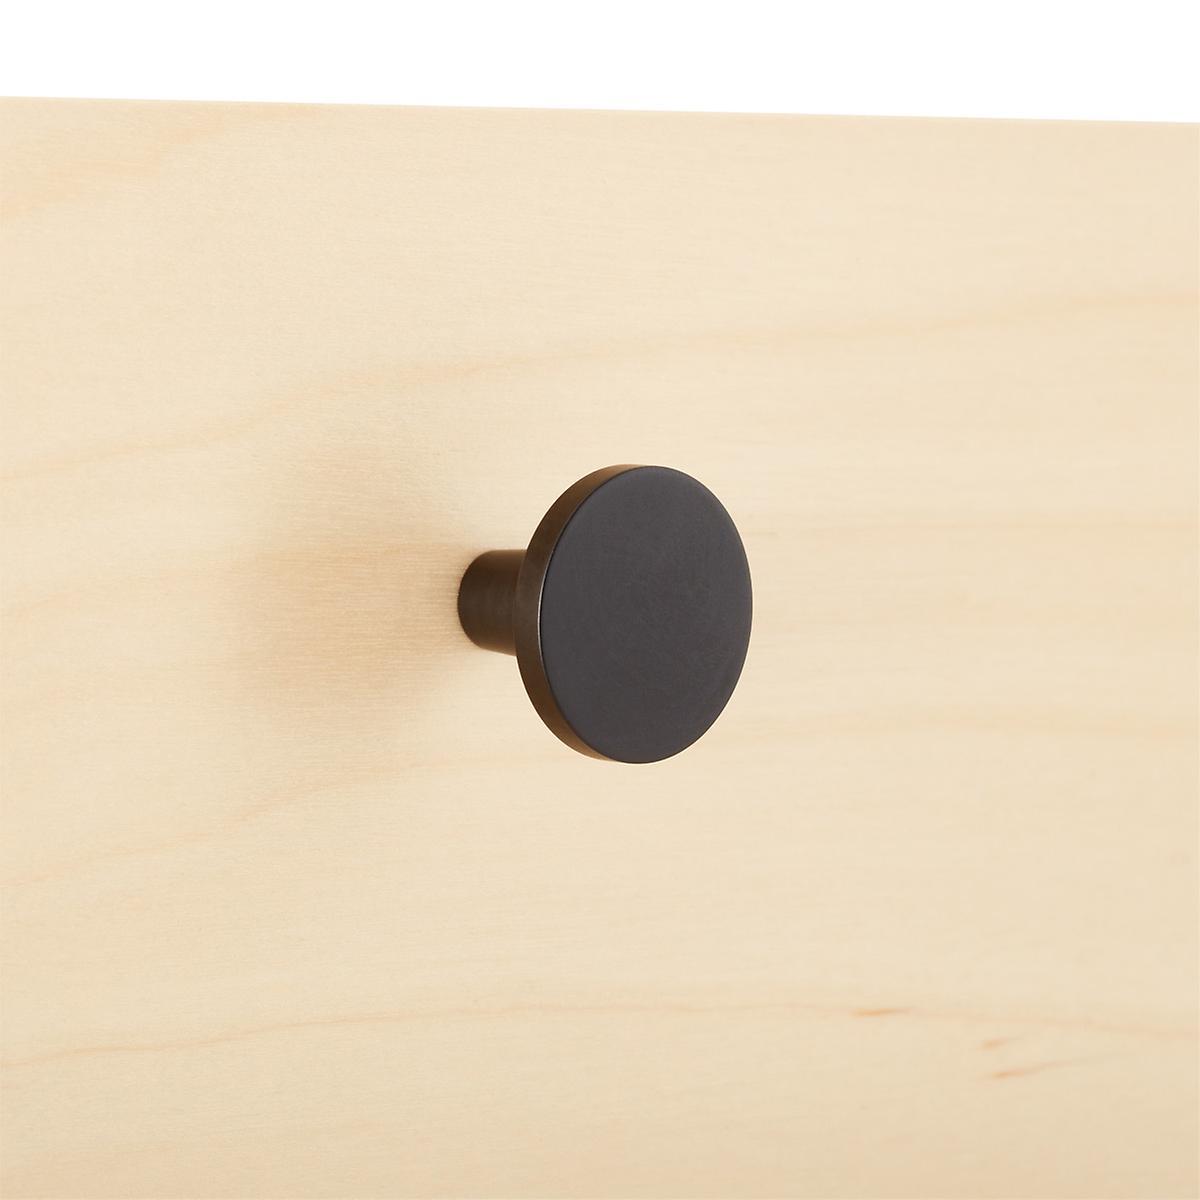 Elfa Decor Oil Rubbed Bronze Flat Knob